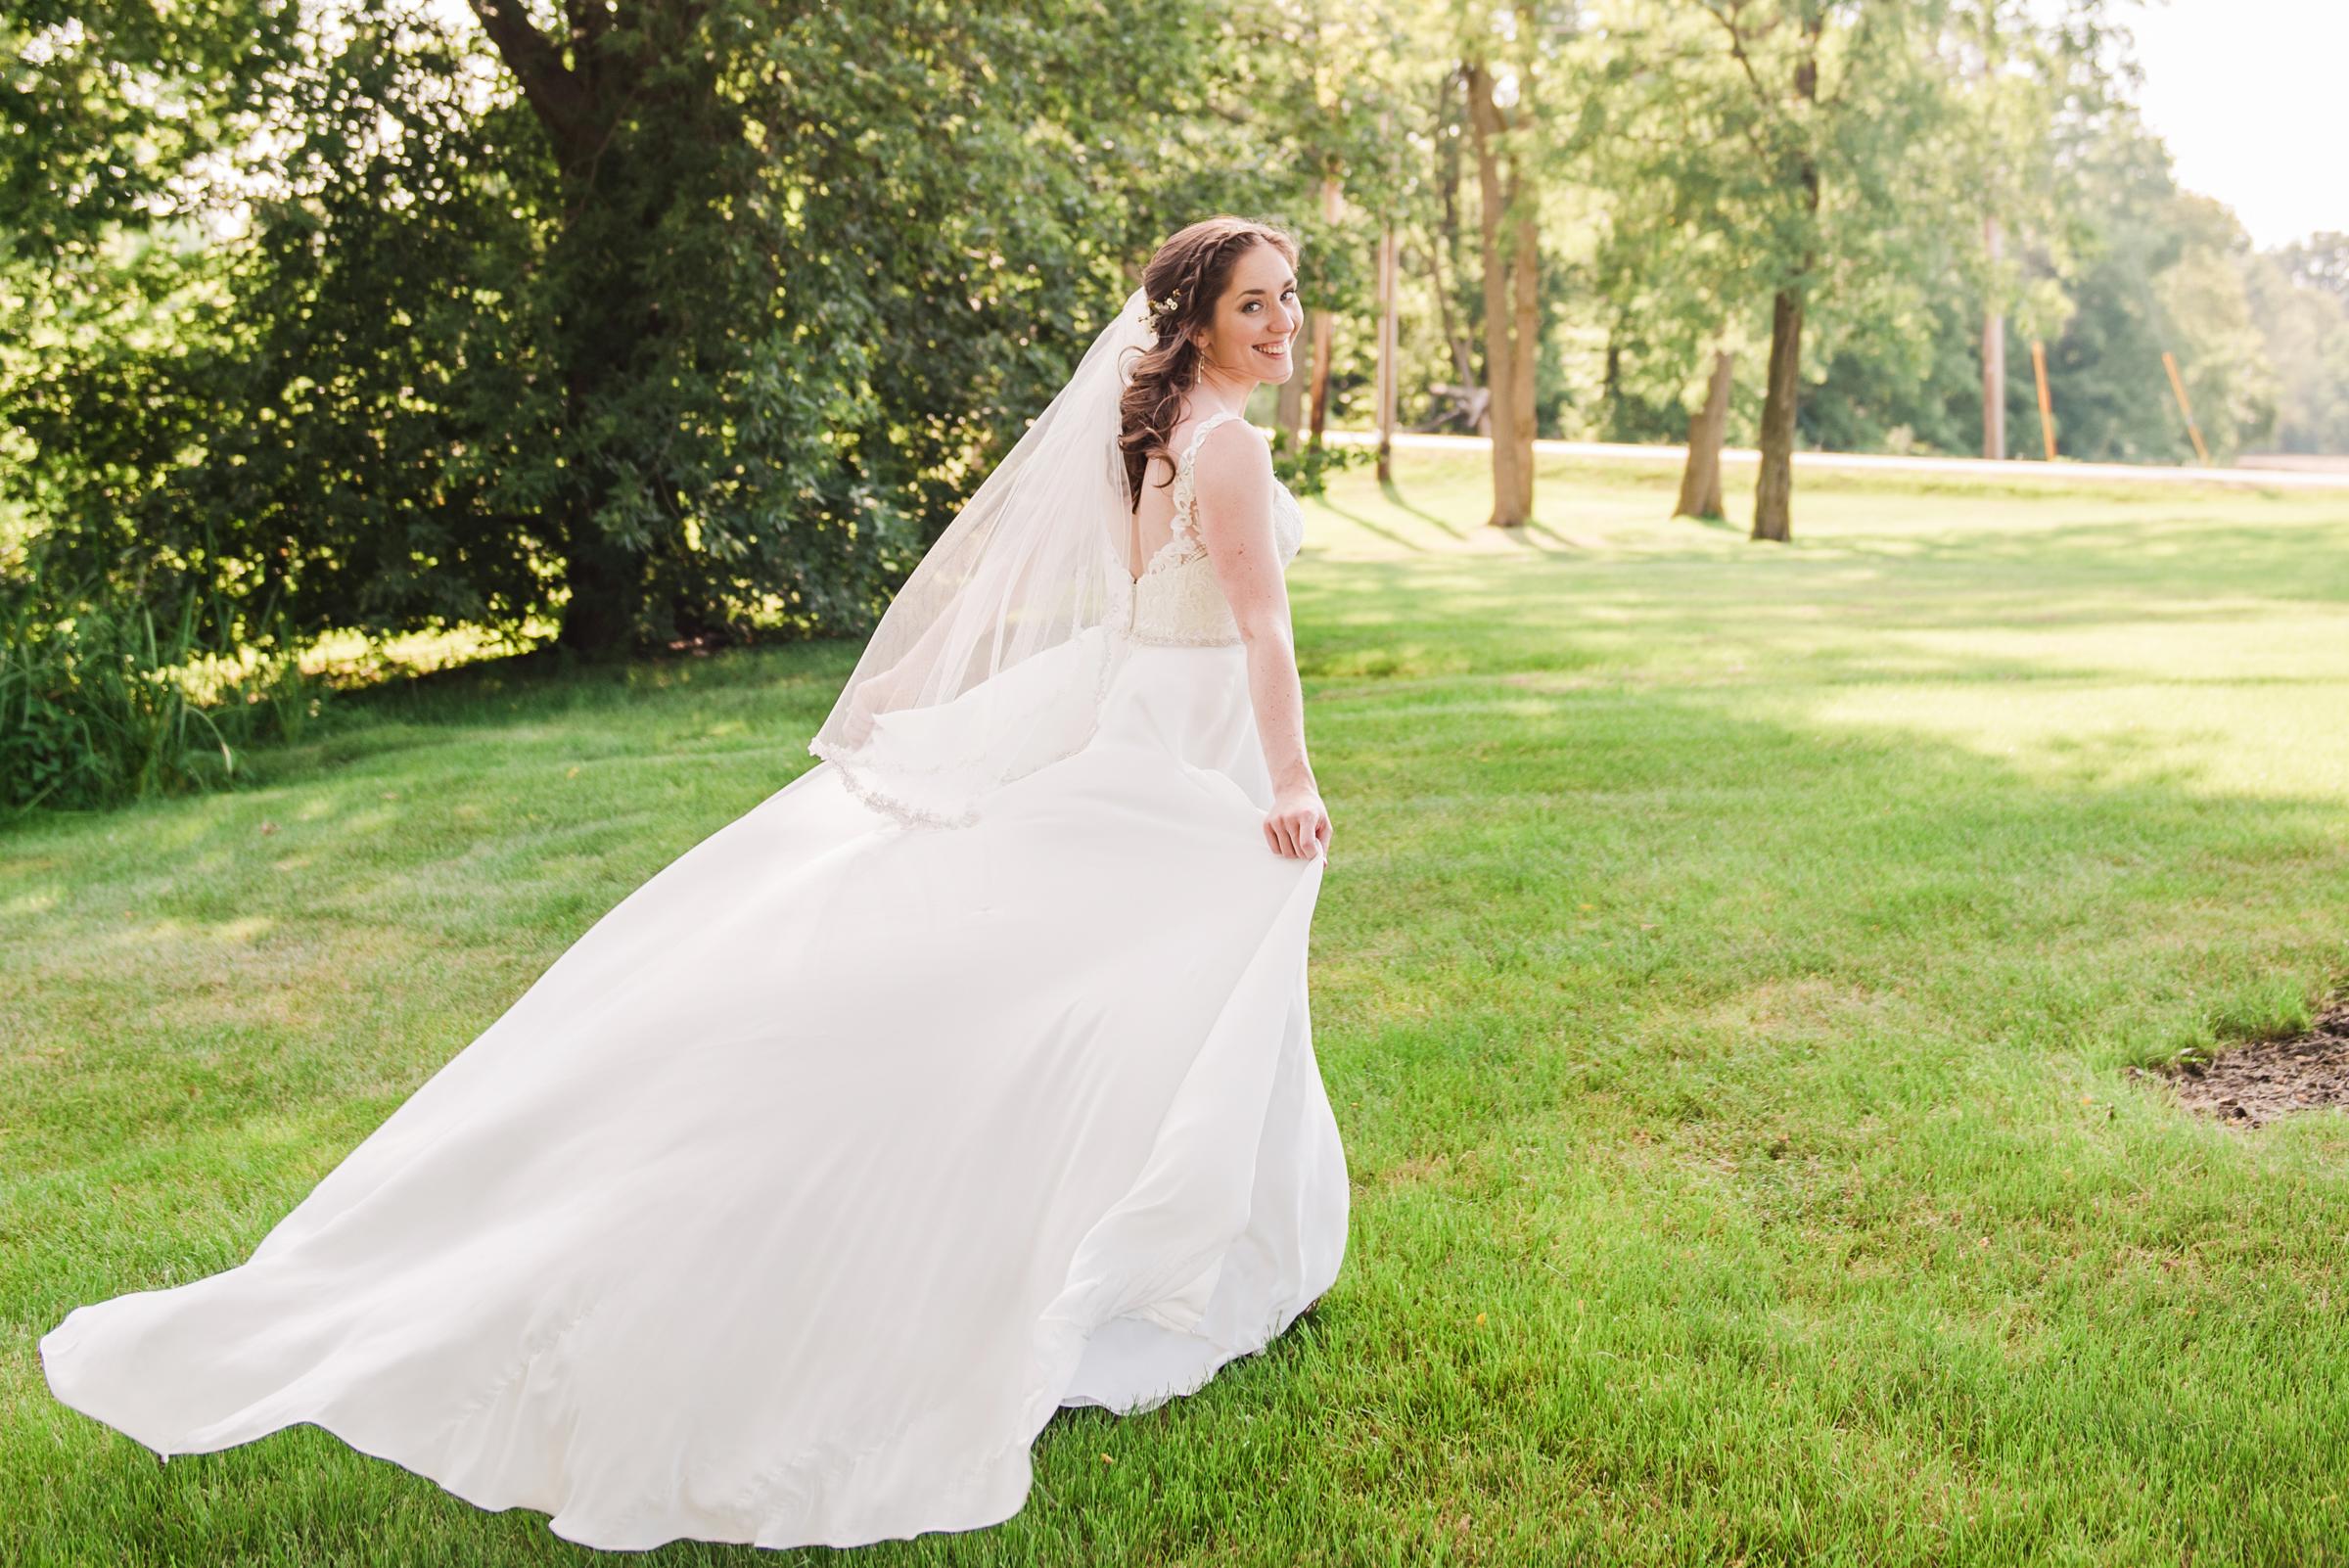 Jerris_Wadsworth_Wedding_Barn_Rochester_Wedding_JILL_STUDIO_Rochester_NY_Photographer_DSC_2753.jpg